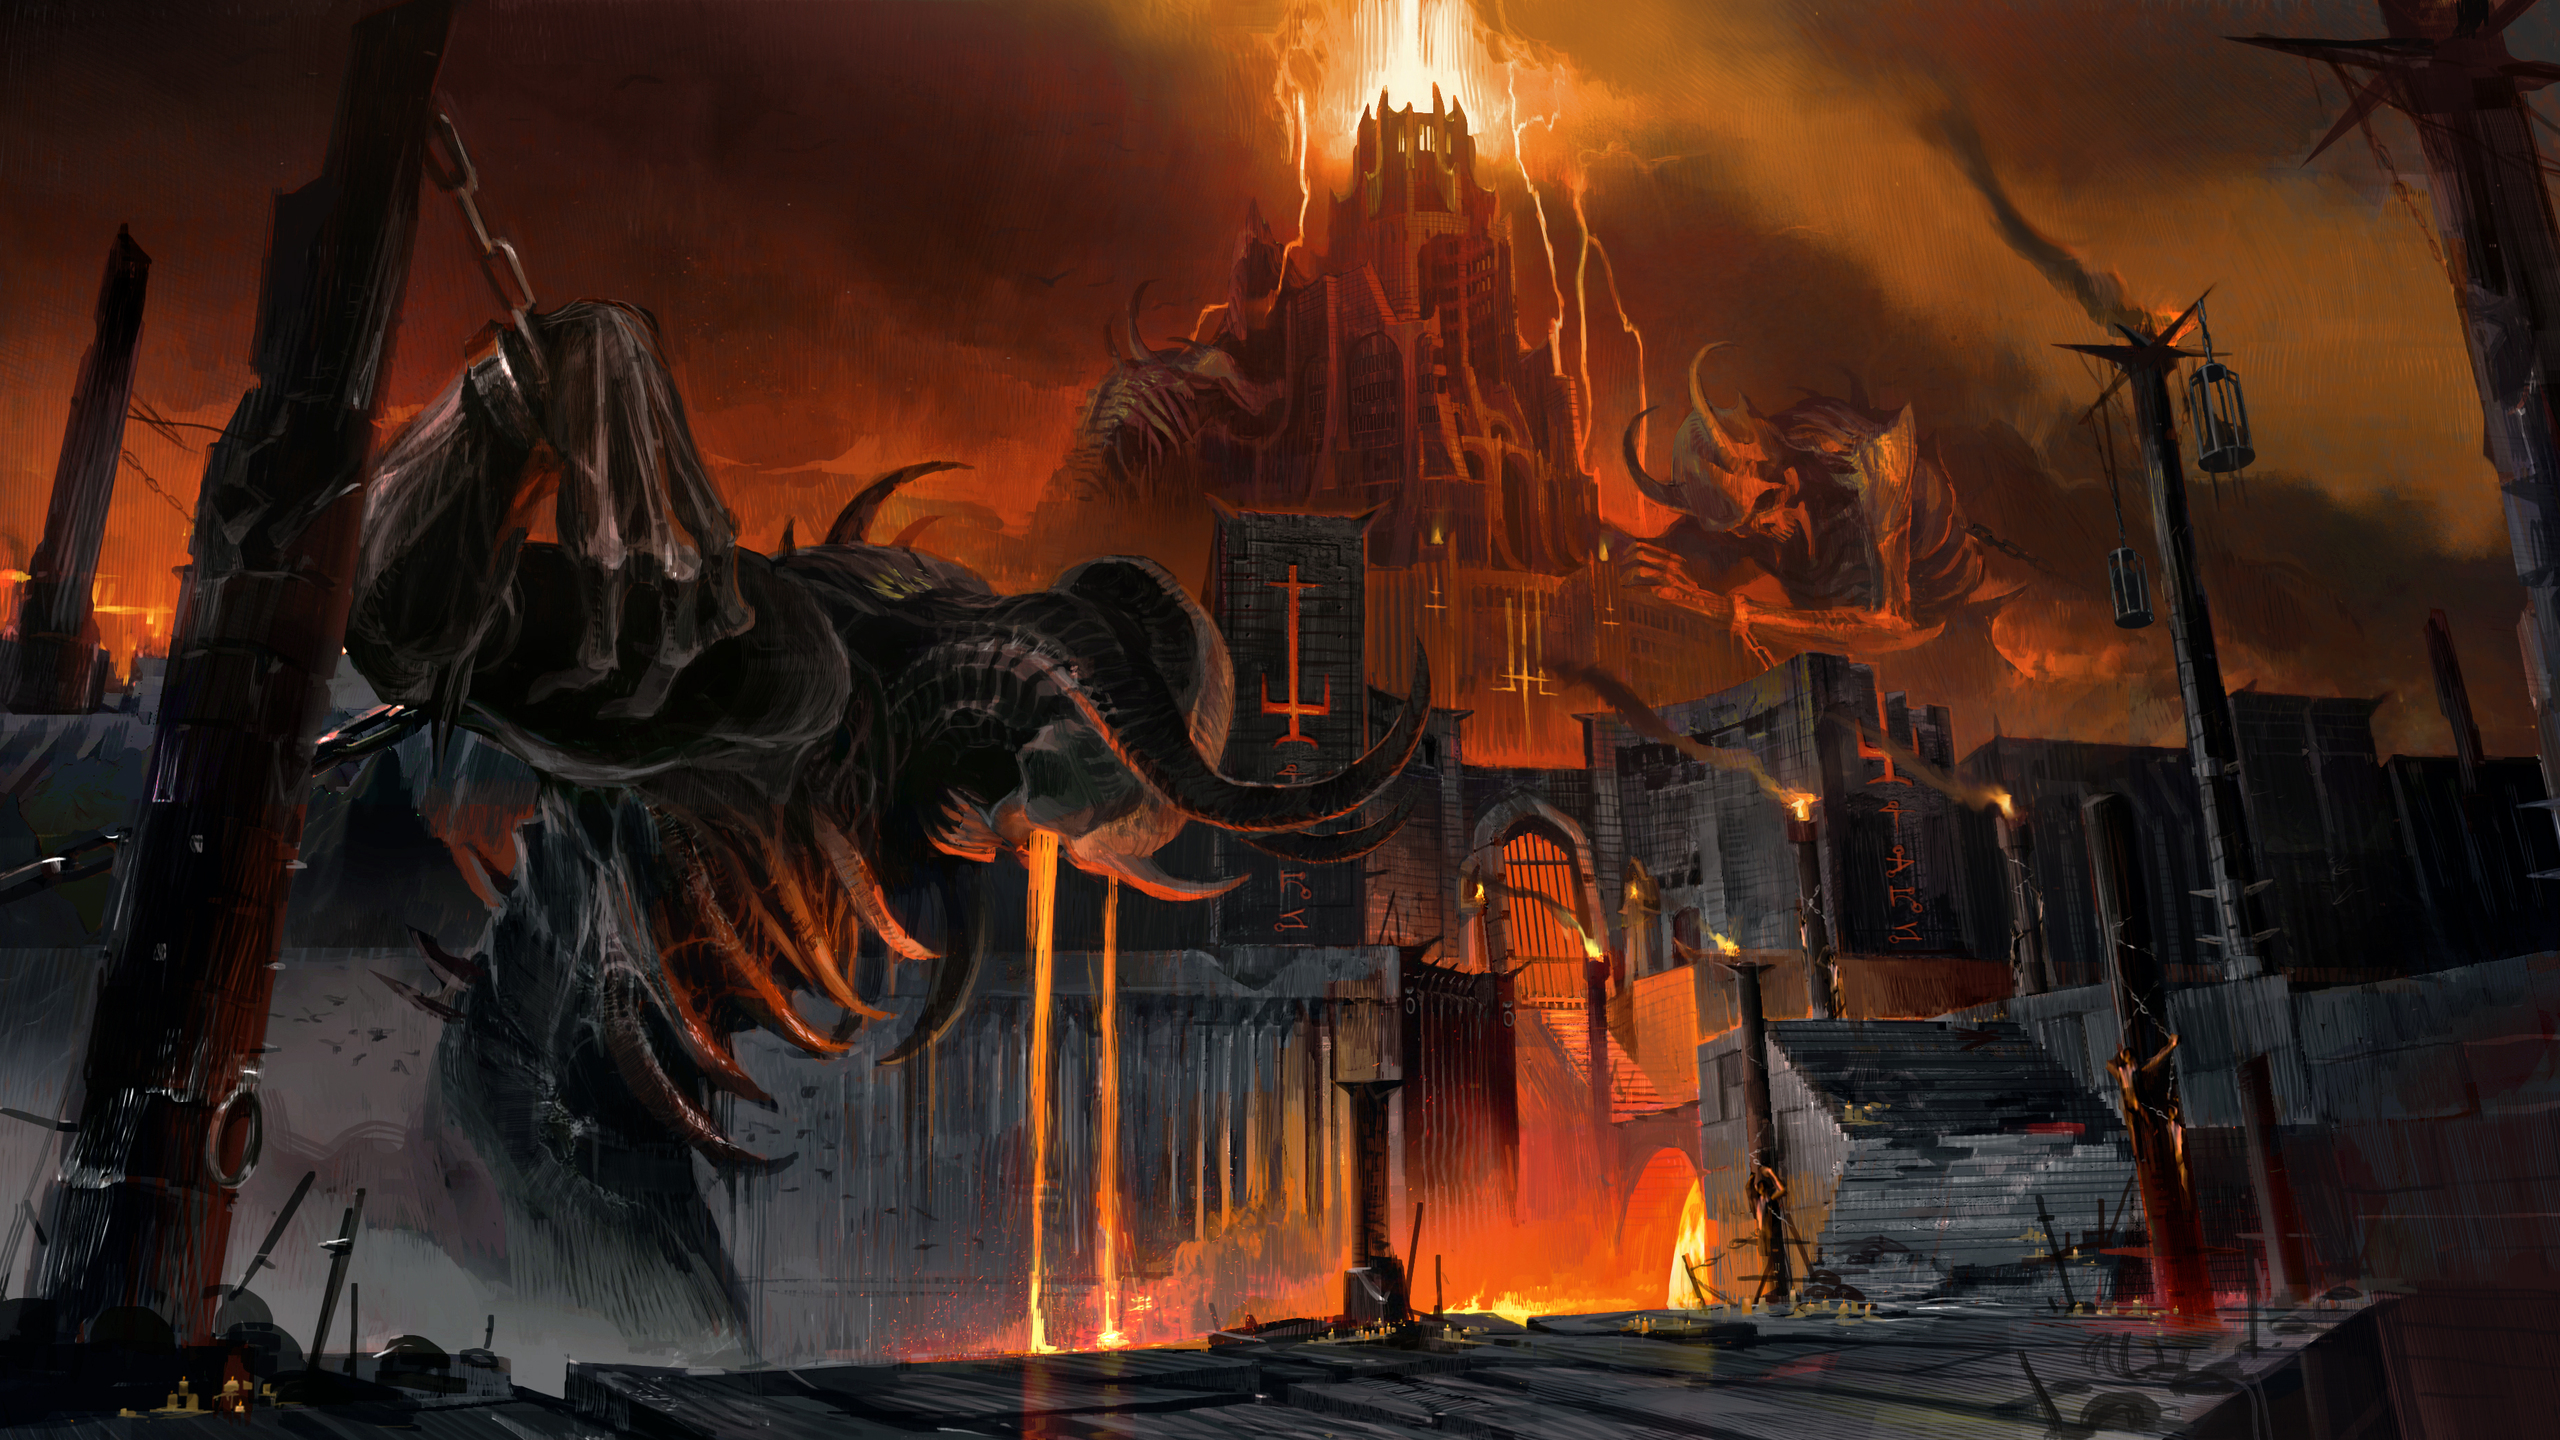 2560x1440 Doom Eternal Artwork 1440p Resolution Hd 4k Wallpapers